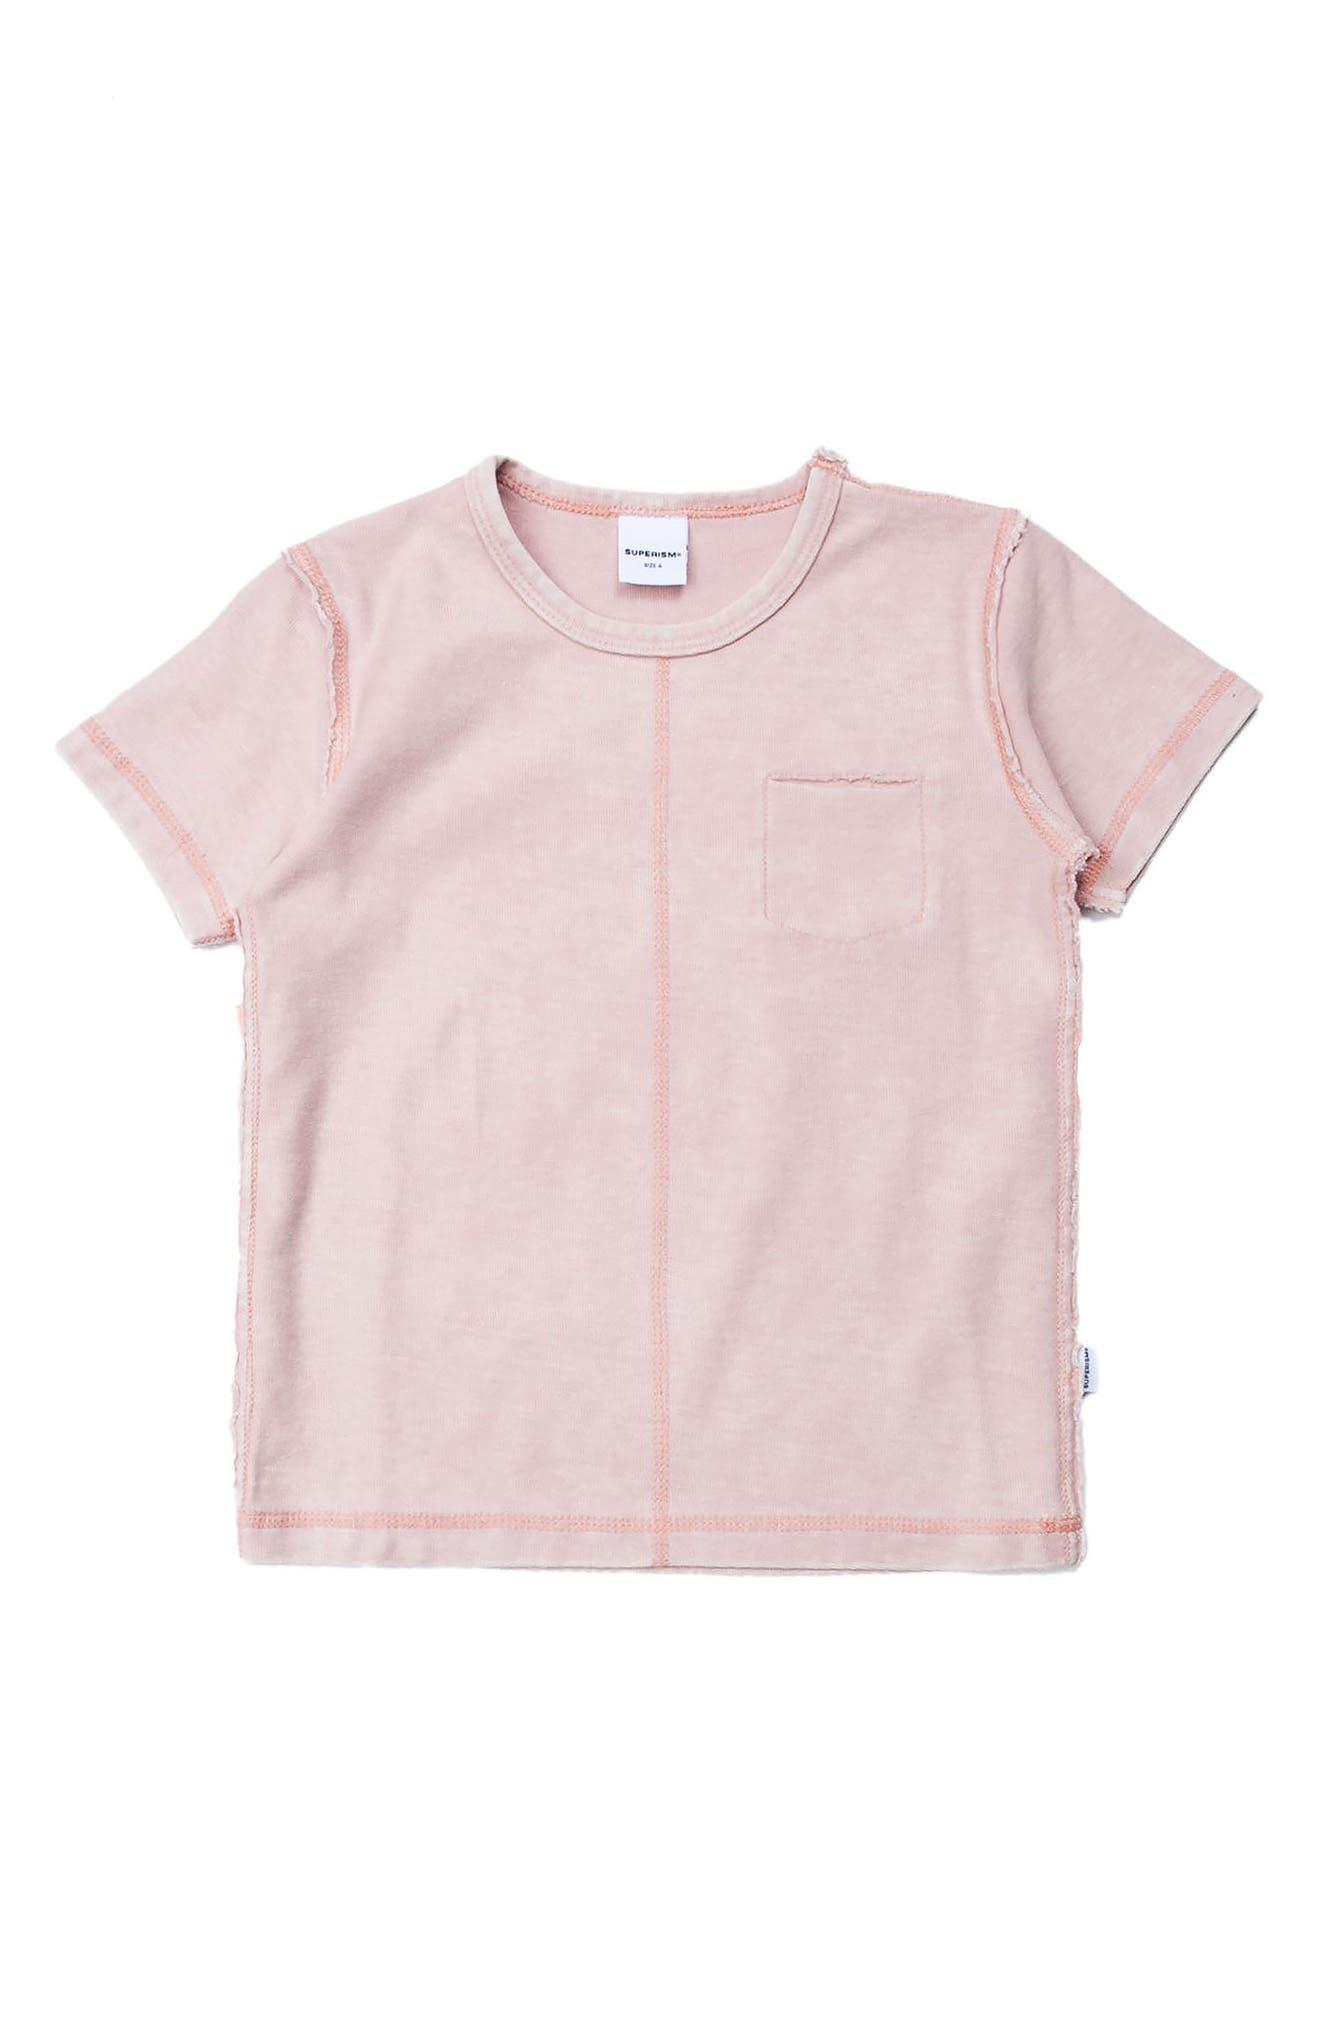 Superism Emery Pocket T-Shirt (Toddler Boys & Little Boys)